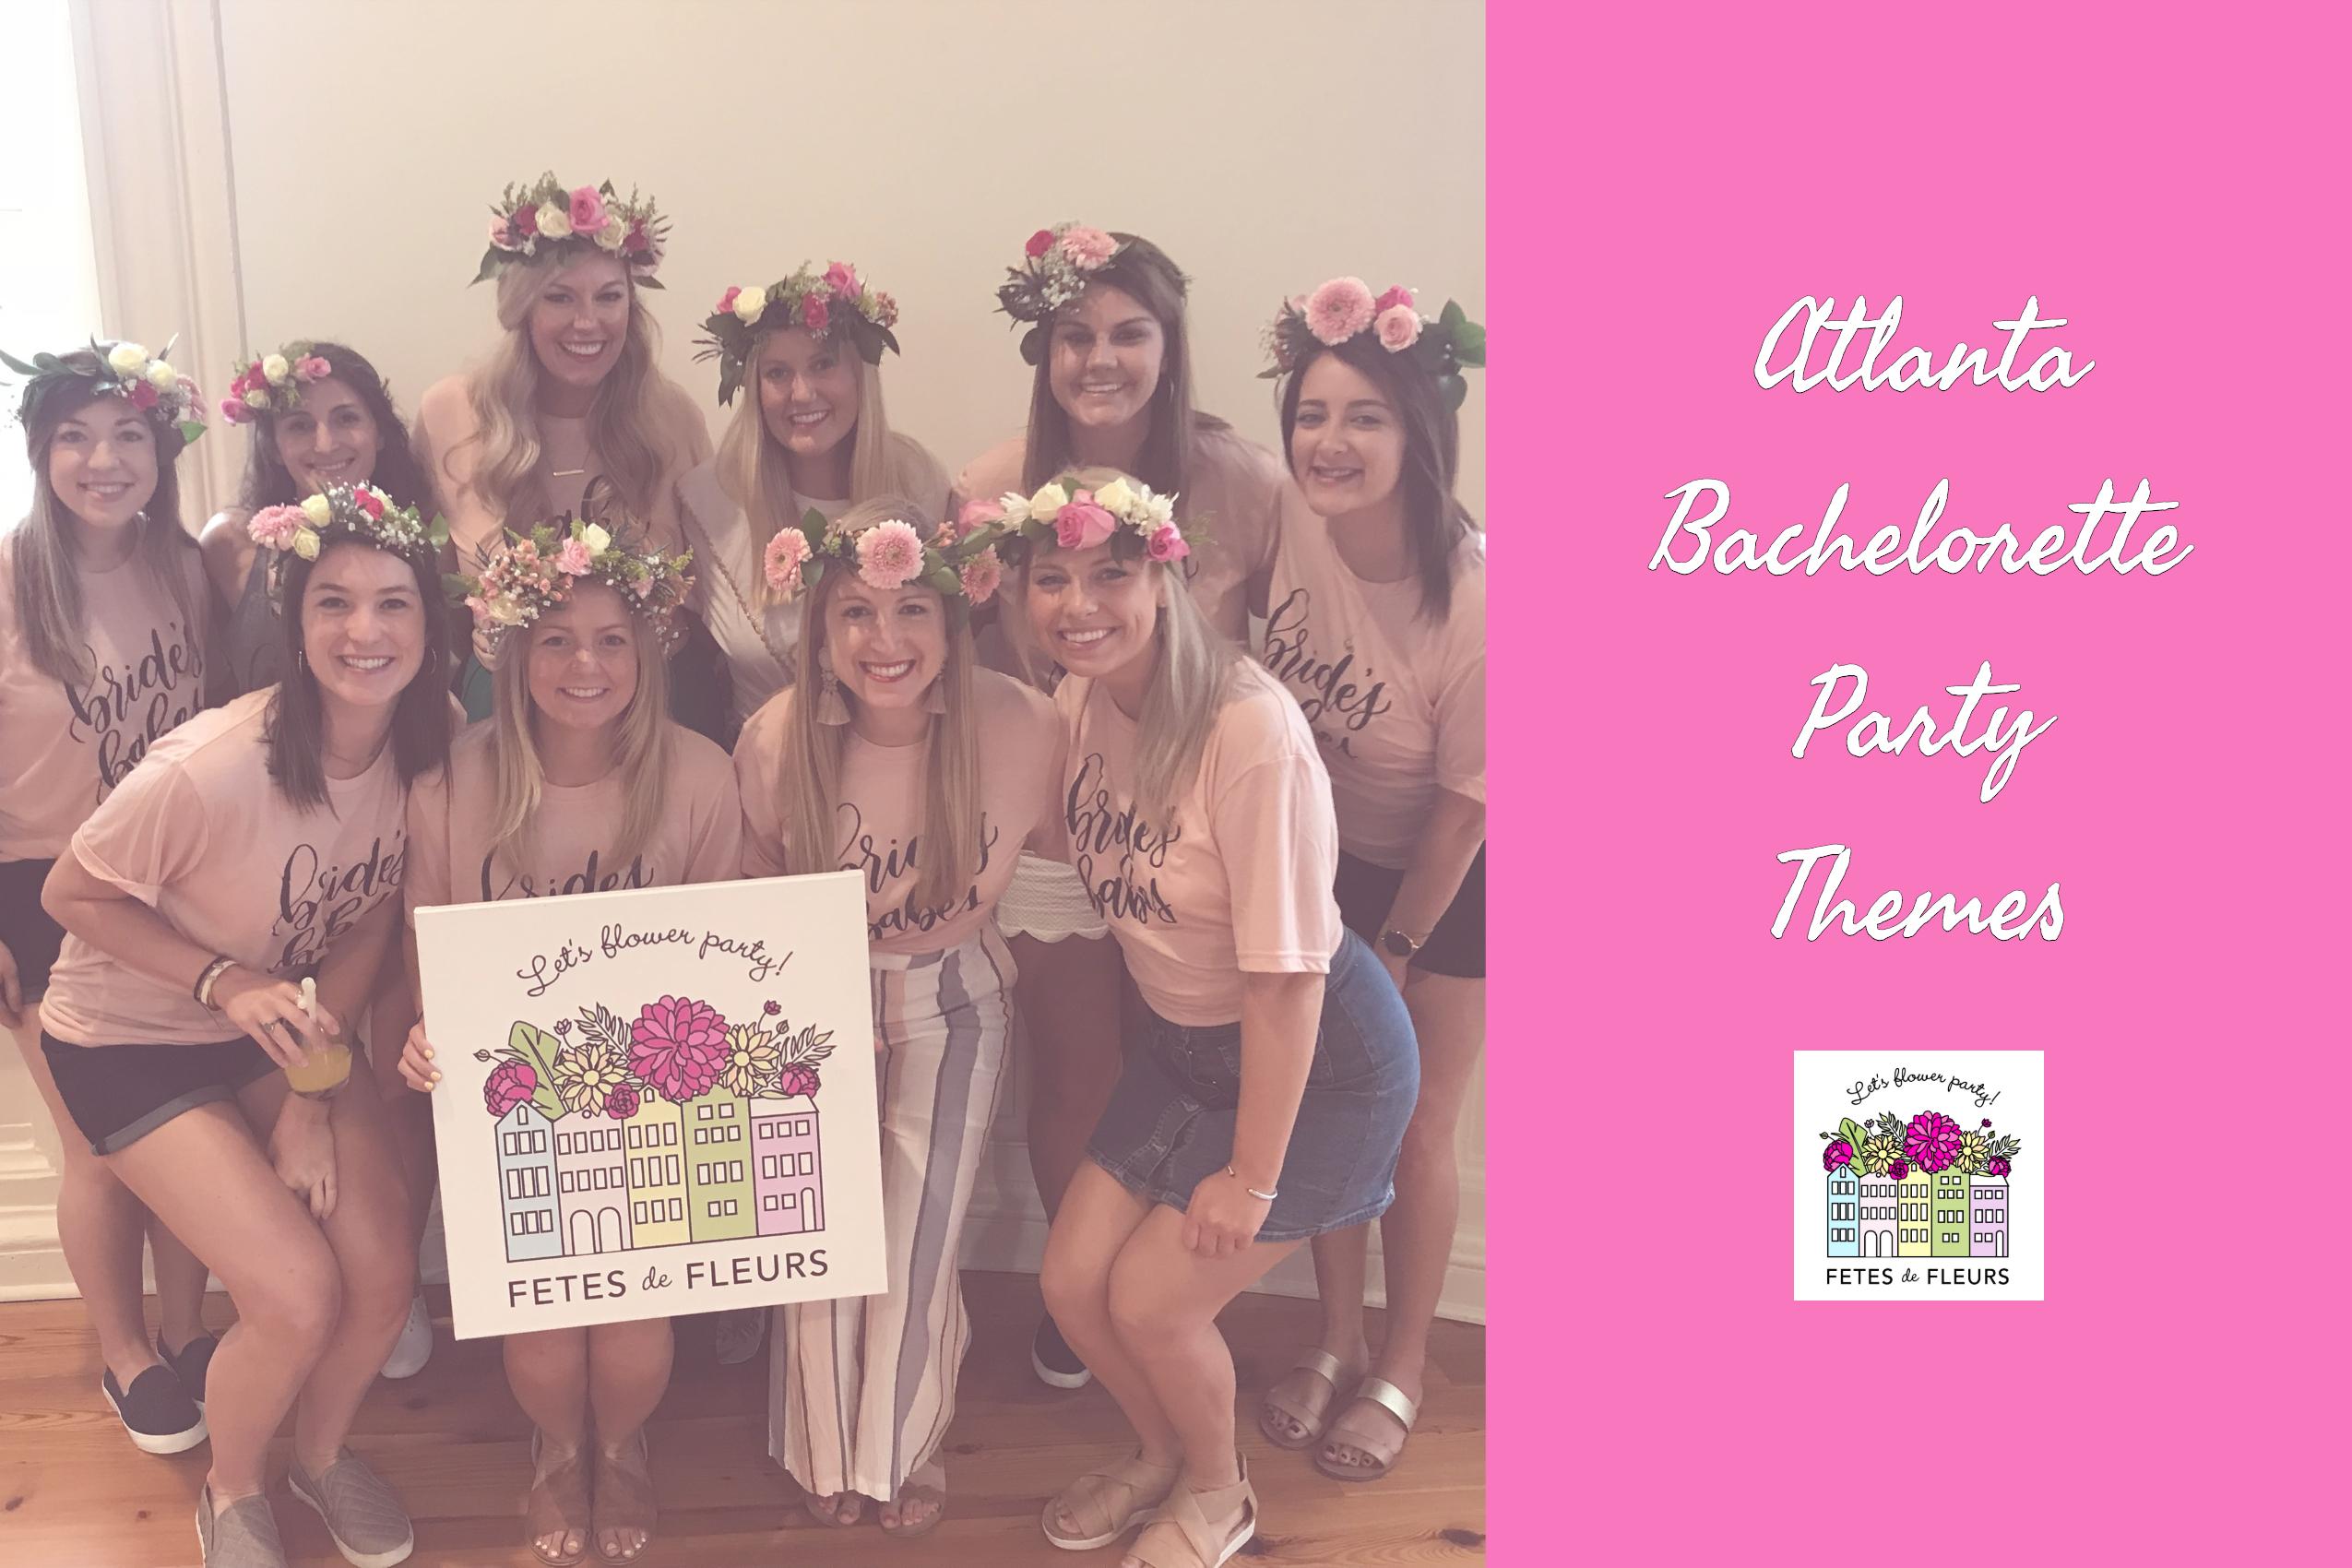 Atlanta Bachelorette Party Blog Bachelorette Themes